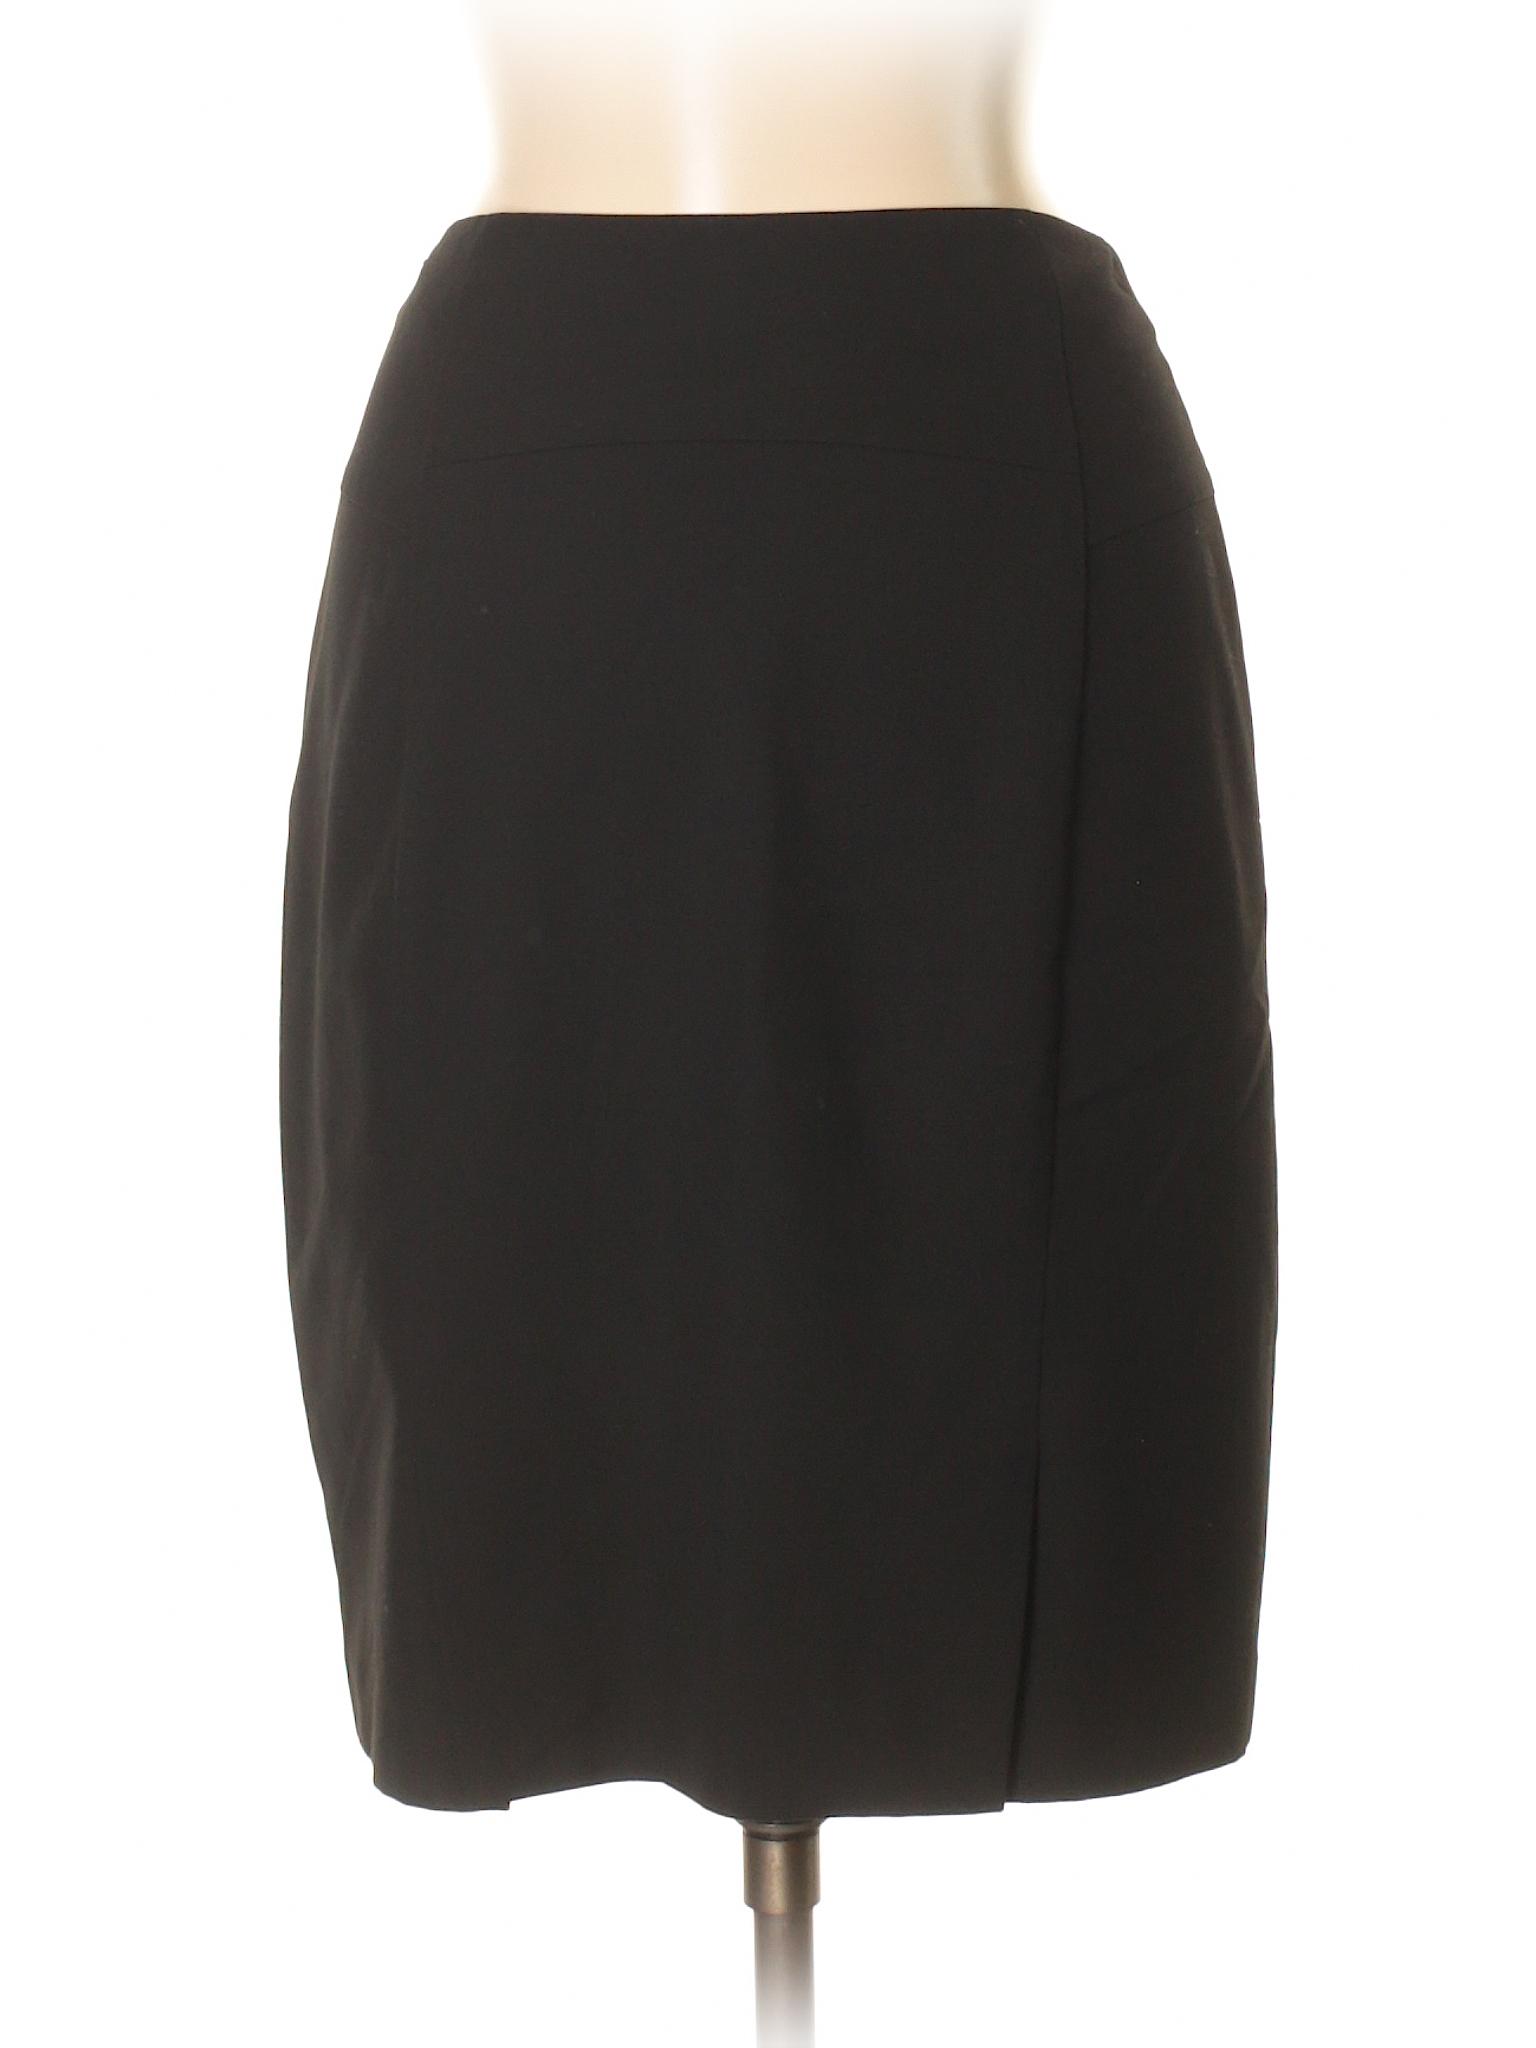 Skirt Skirt Casual Boutique Boutique Casual Boutique Casual Boutique Casual Skirt axtvzqw